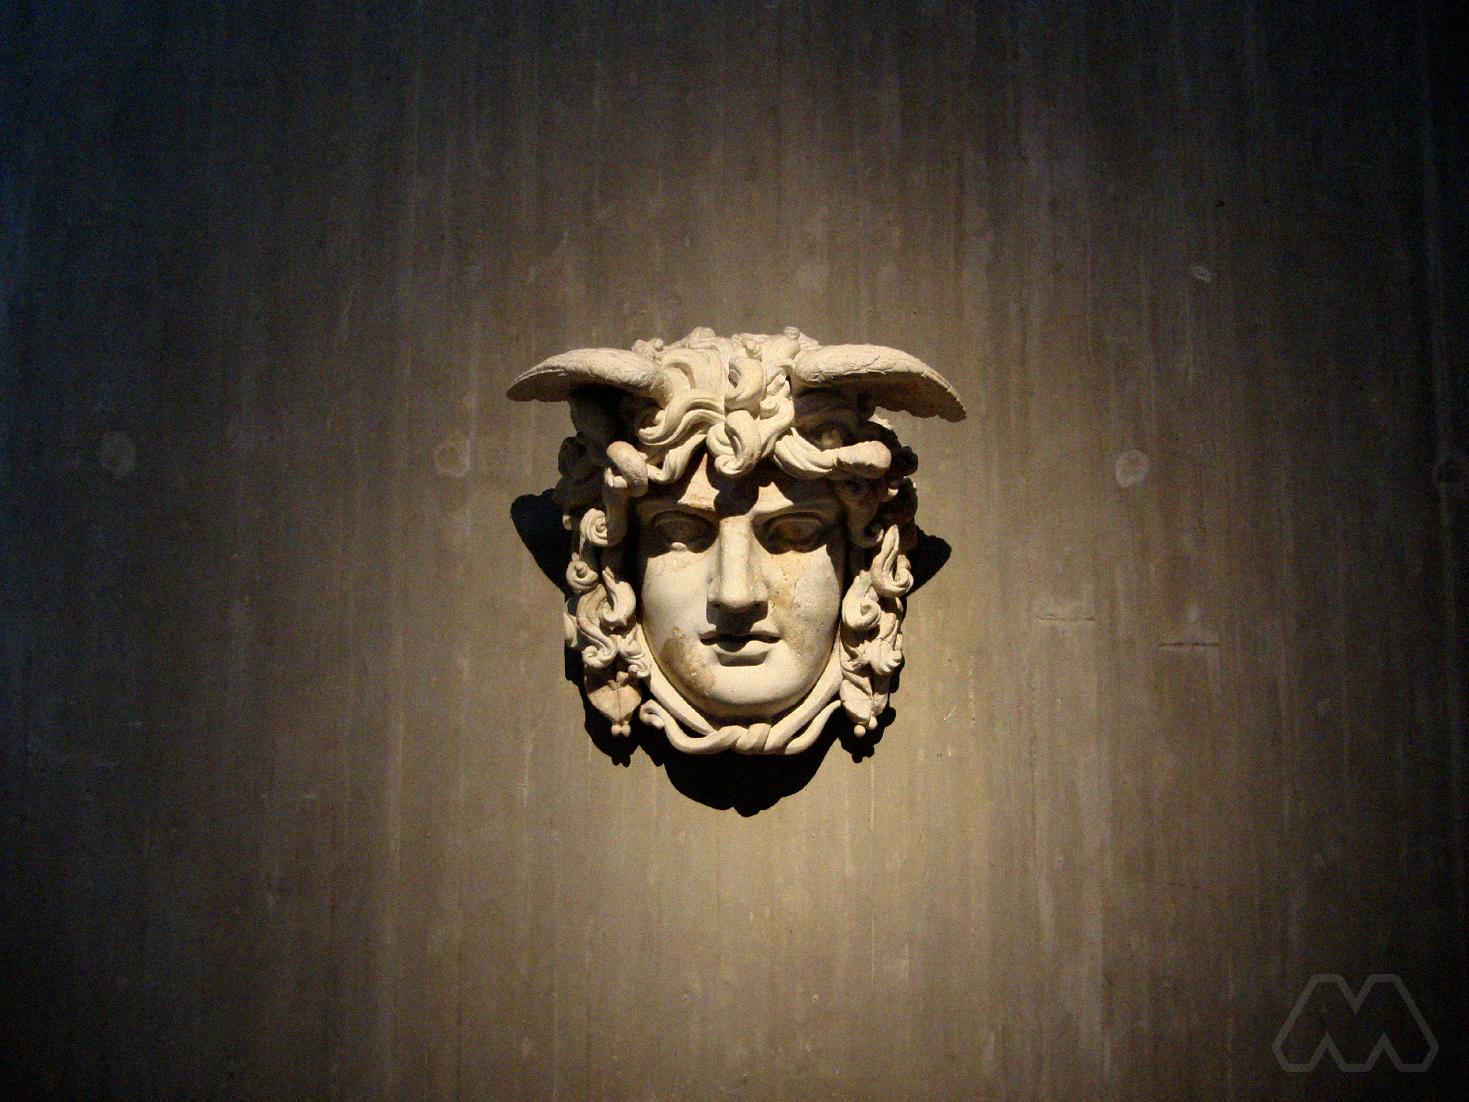 Maschera della Gorgone Medusa – Colonia